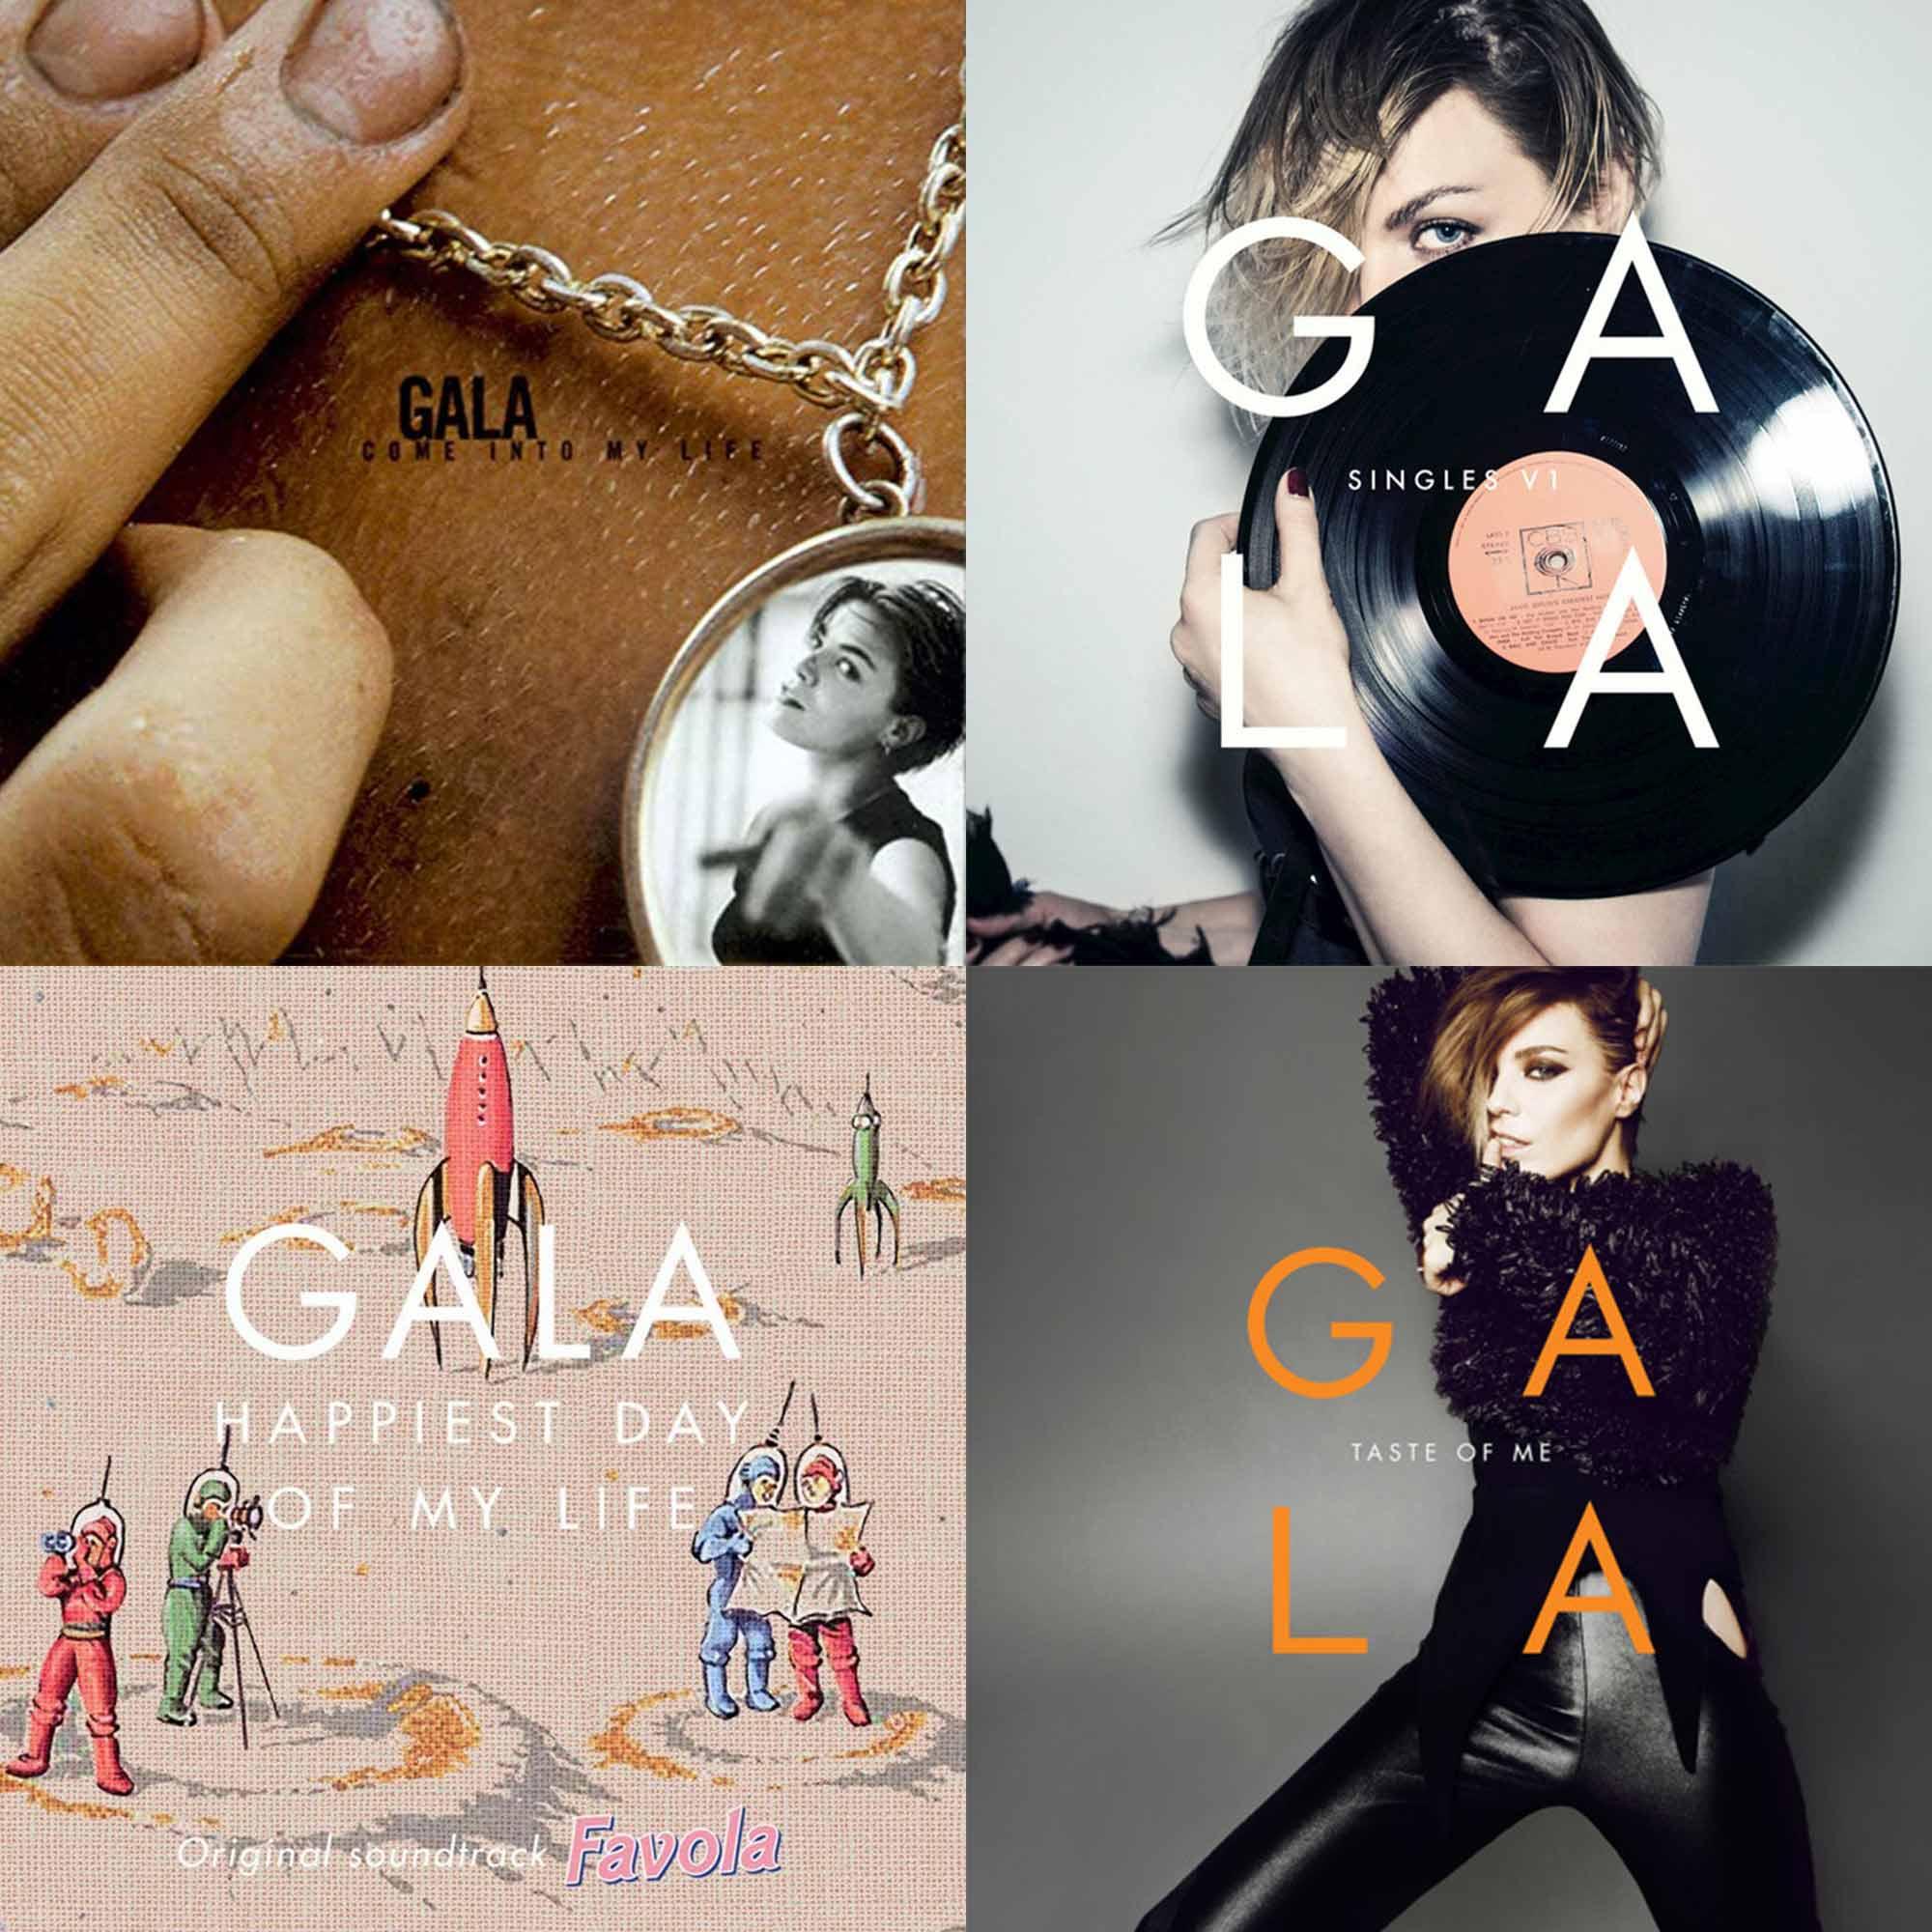 Gala Offical Music Playlist